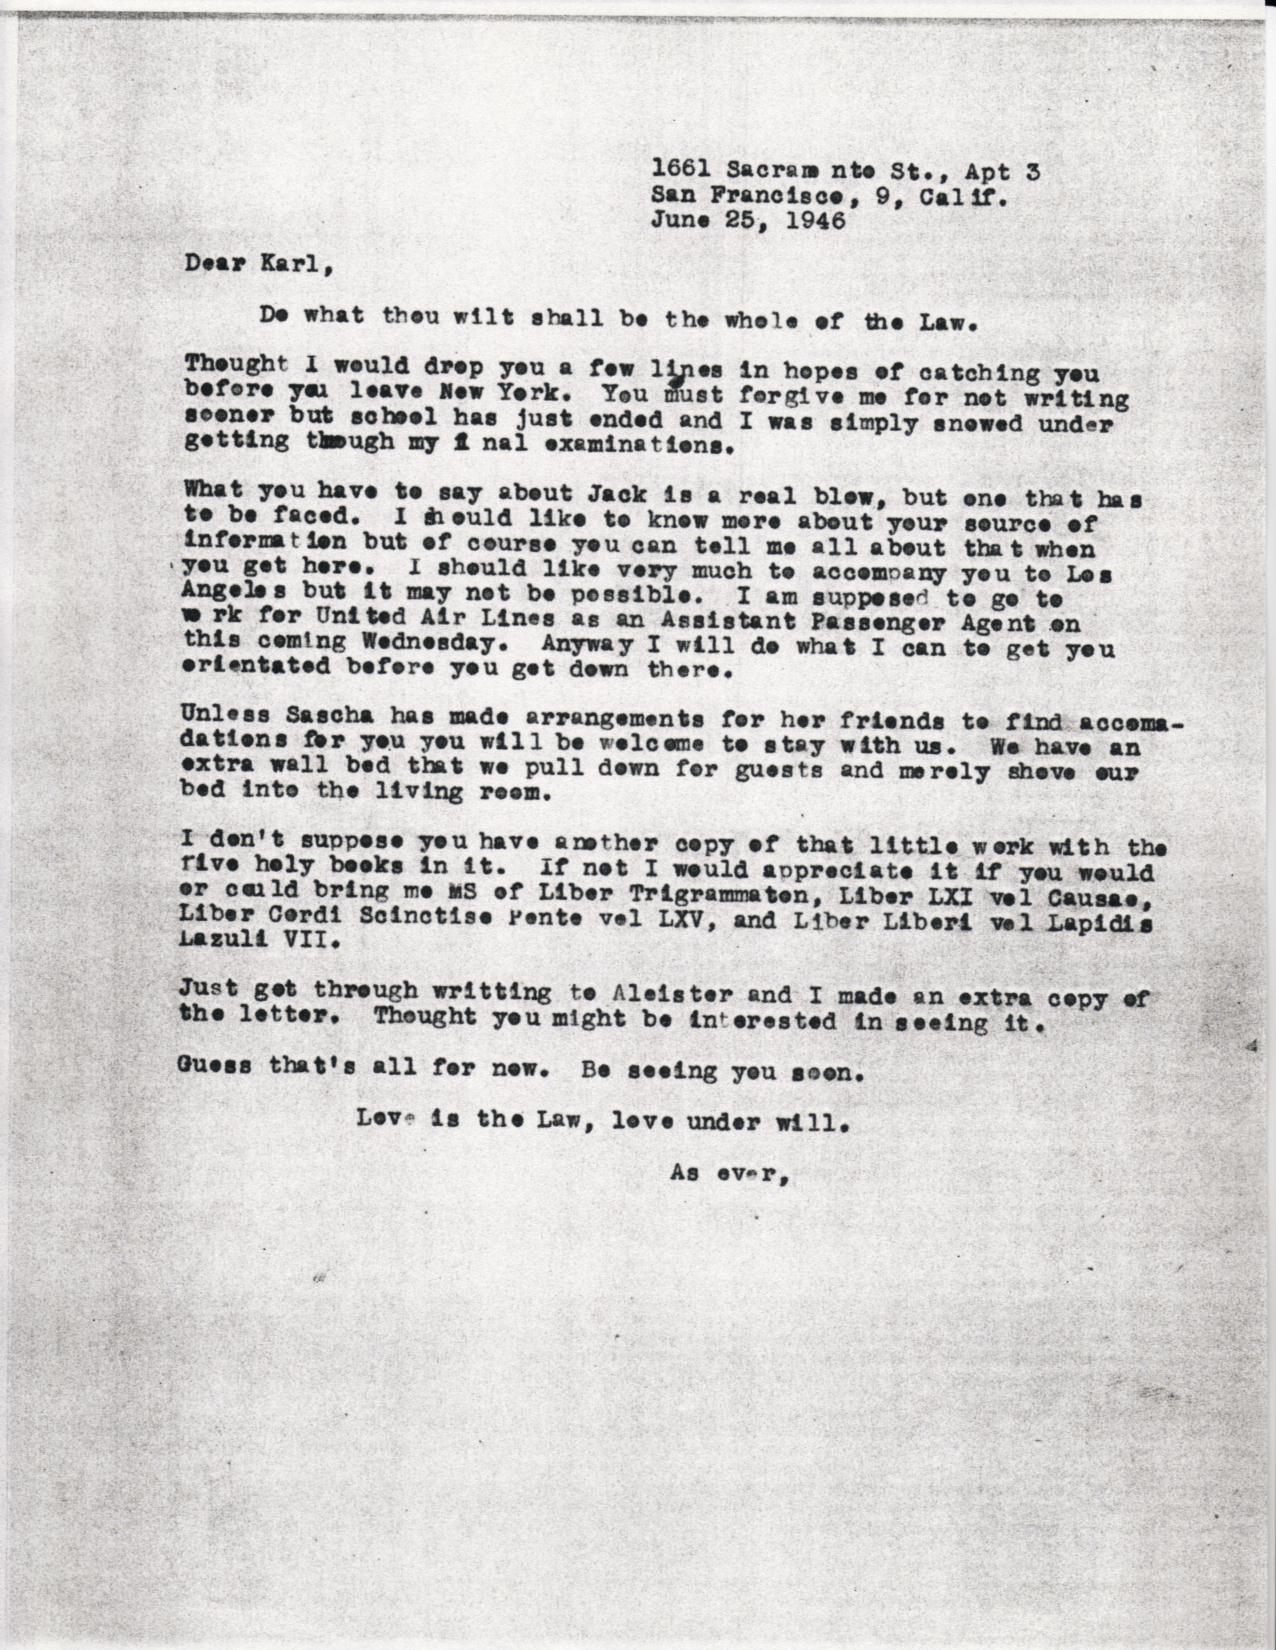 (06/25/1946) Grady McMurtry to Karl Germer